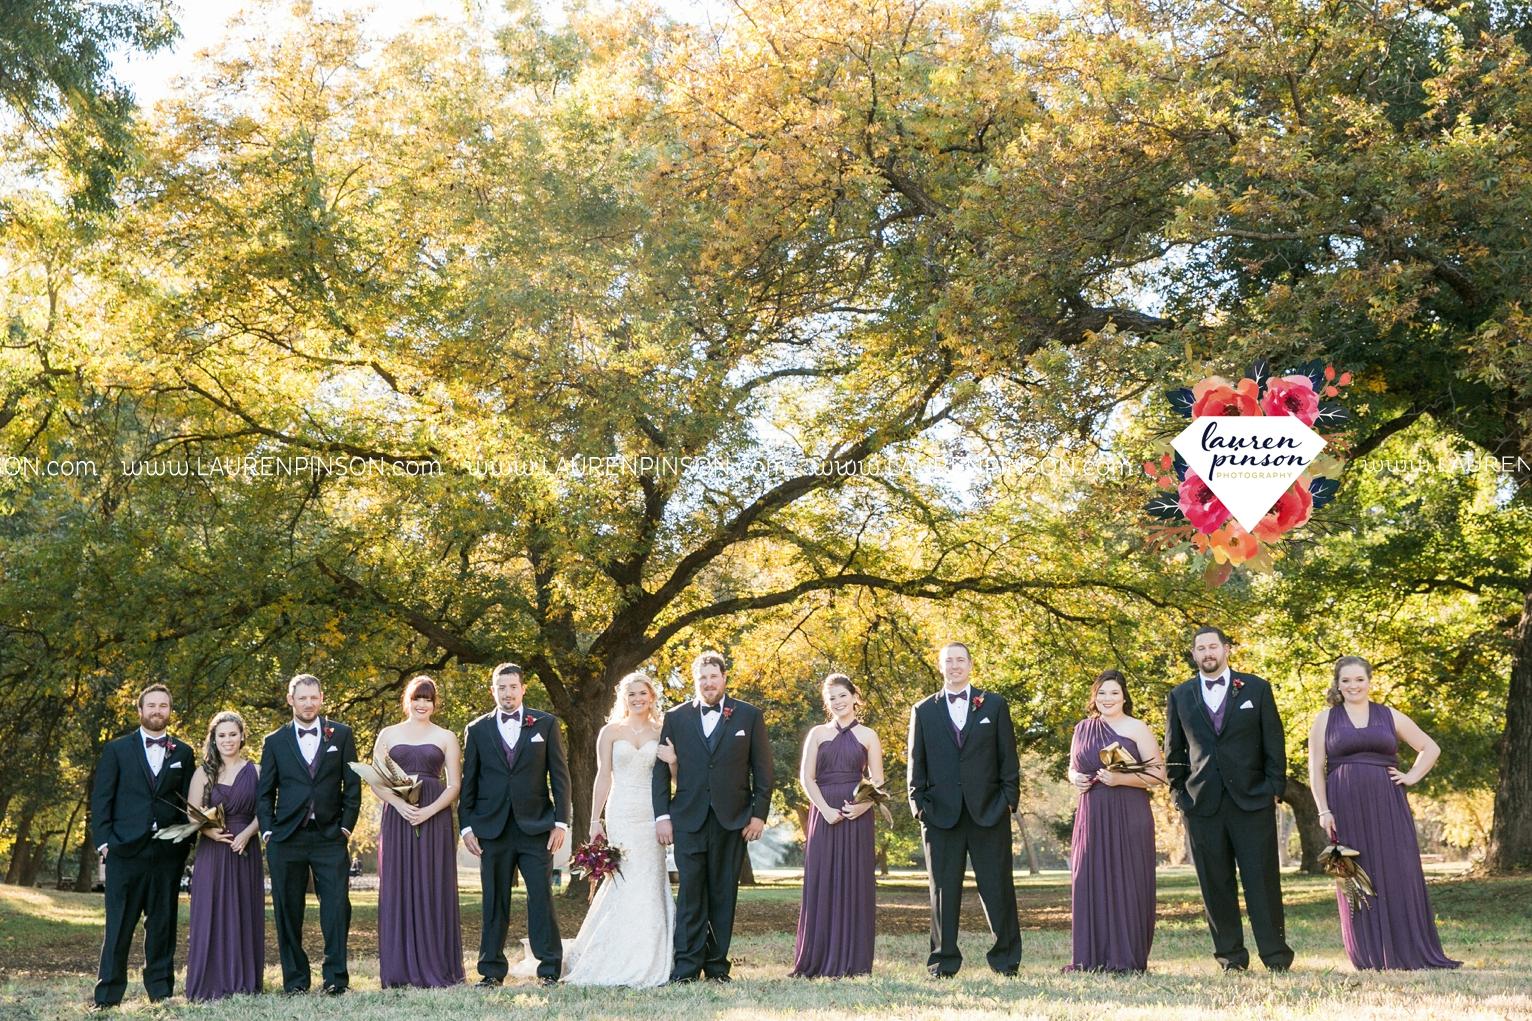 rustic-wichita-falls-texas-wedding-photographer-gold-glam-mayfield-events-market-street-united-allue-bridals-fall_1757.jpg